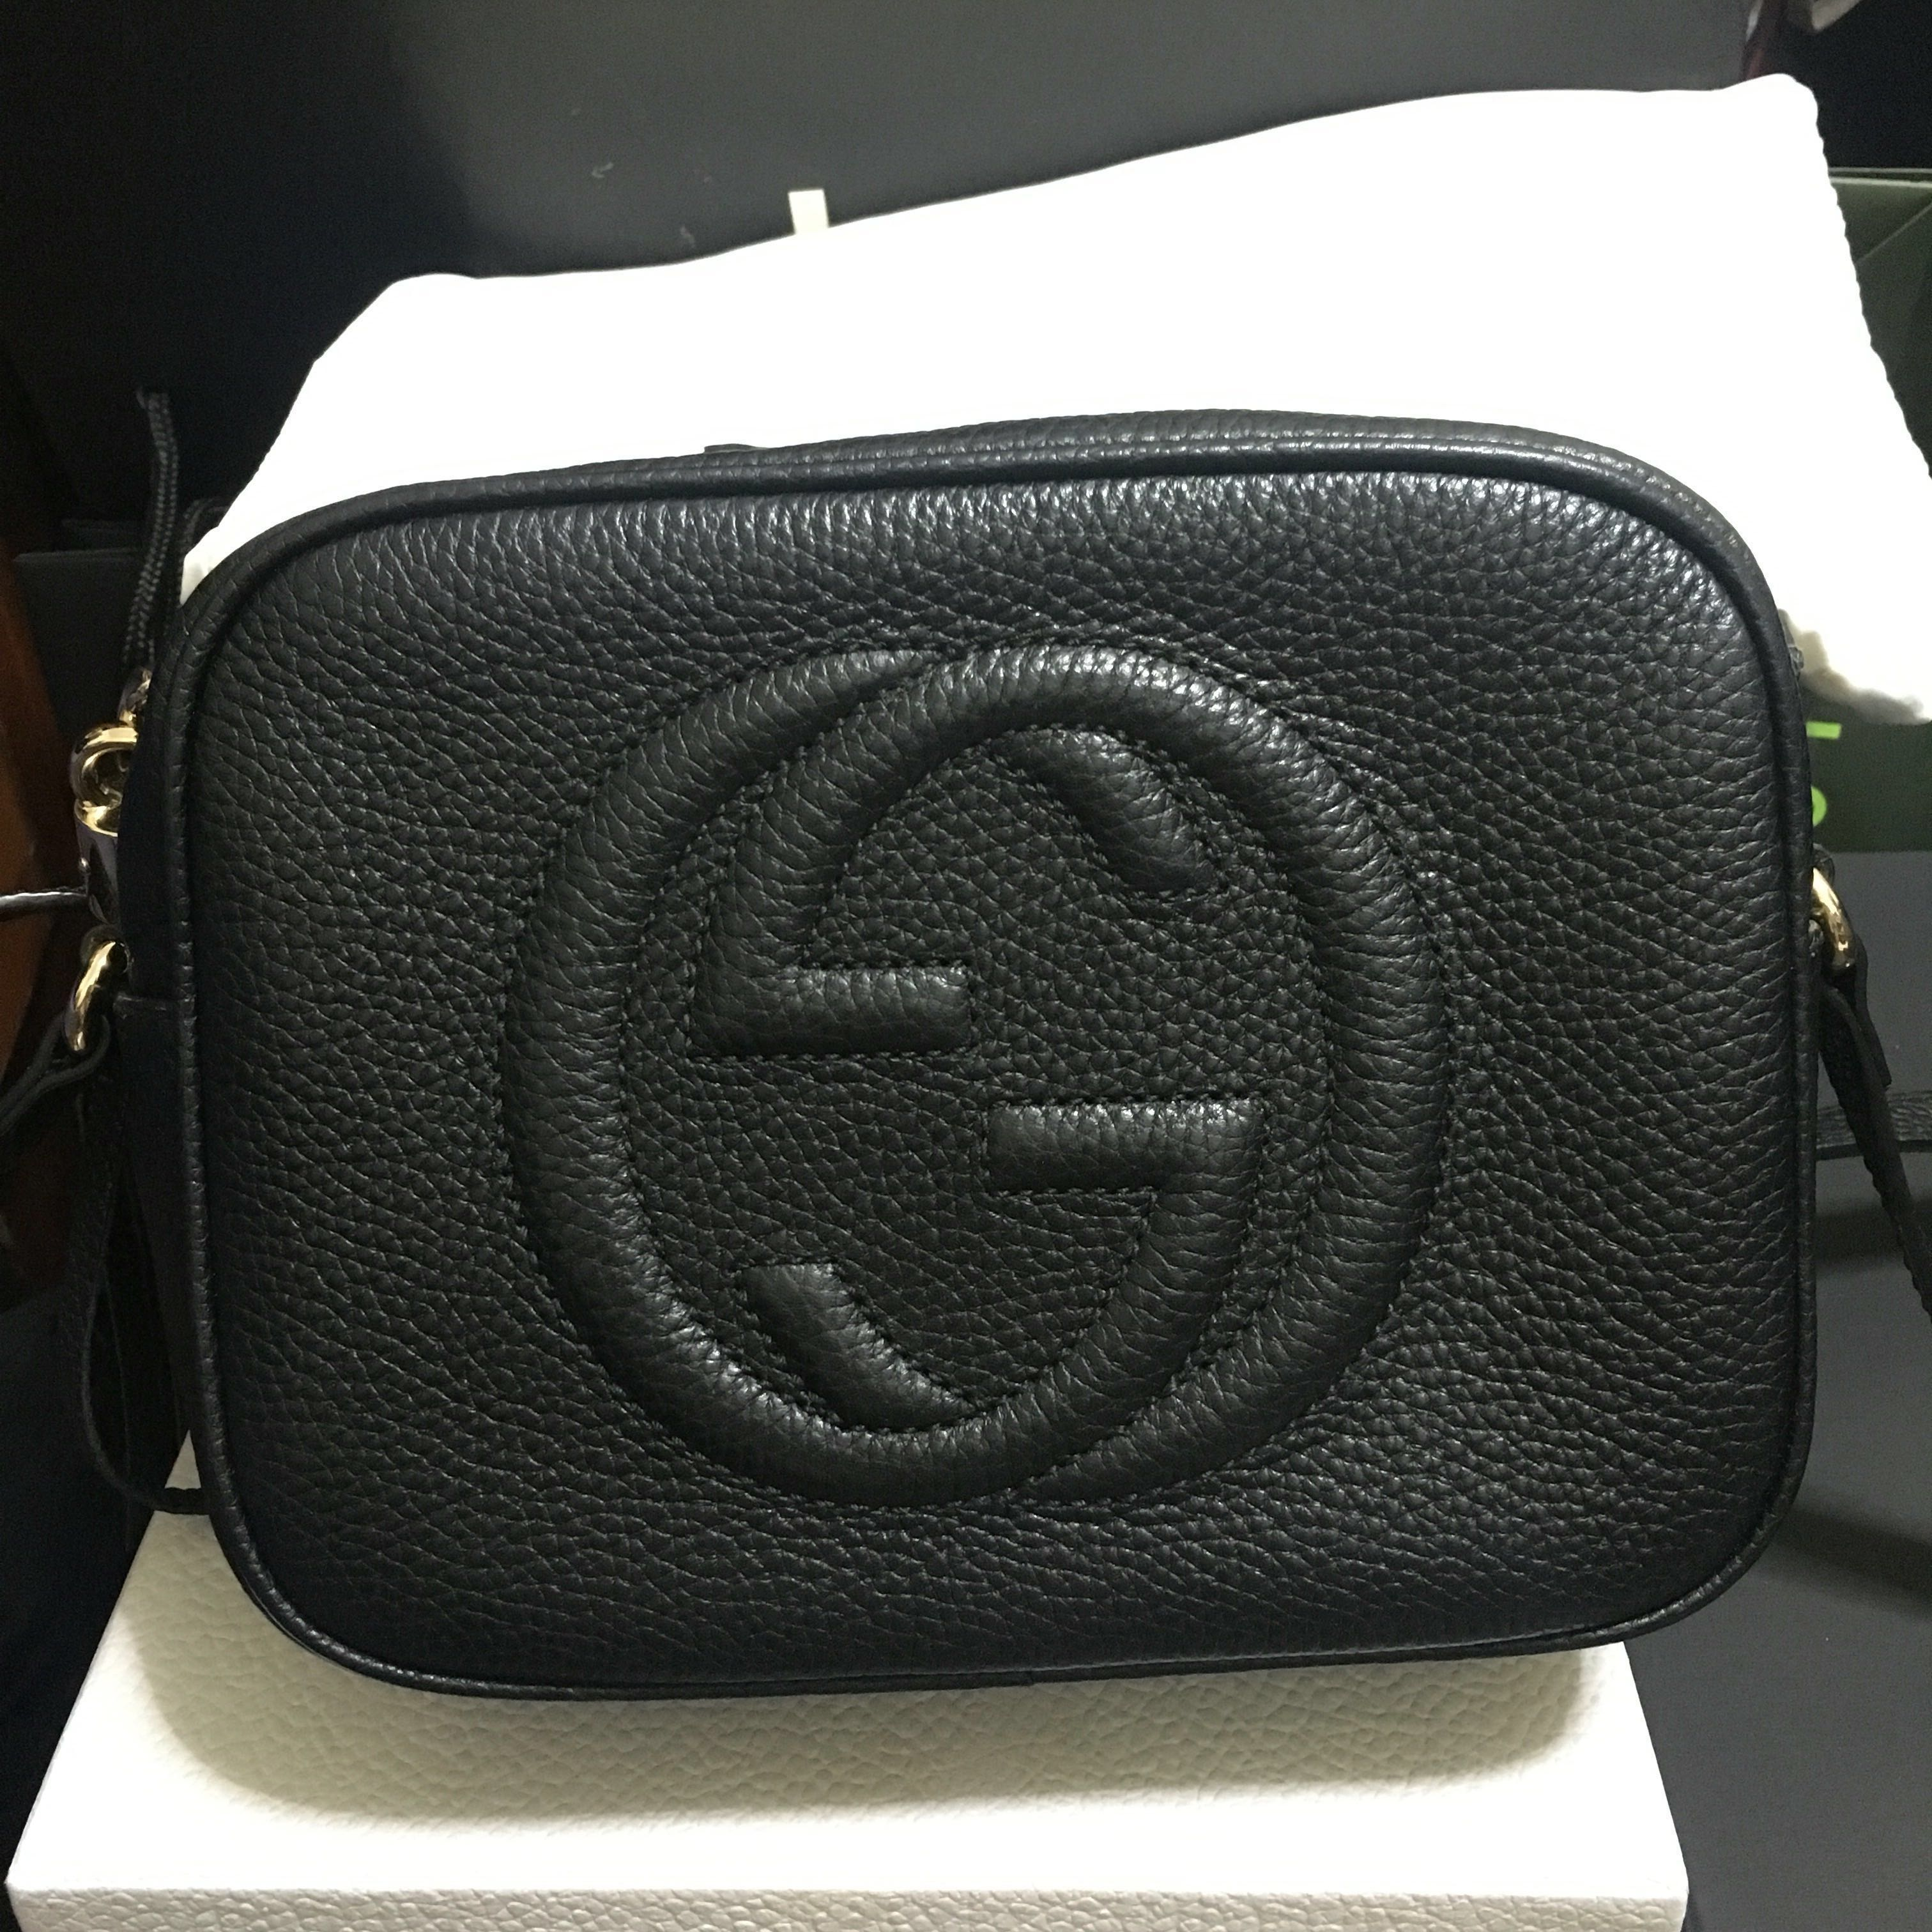 993c5e112f38 LN Gucci Soho Disco Tassel Black, Luxury, Bags & Wallets, Handbags ...